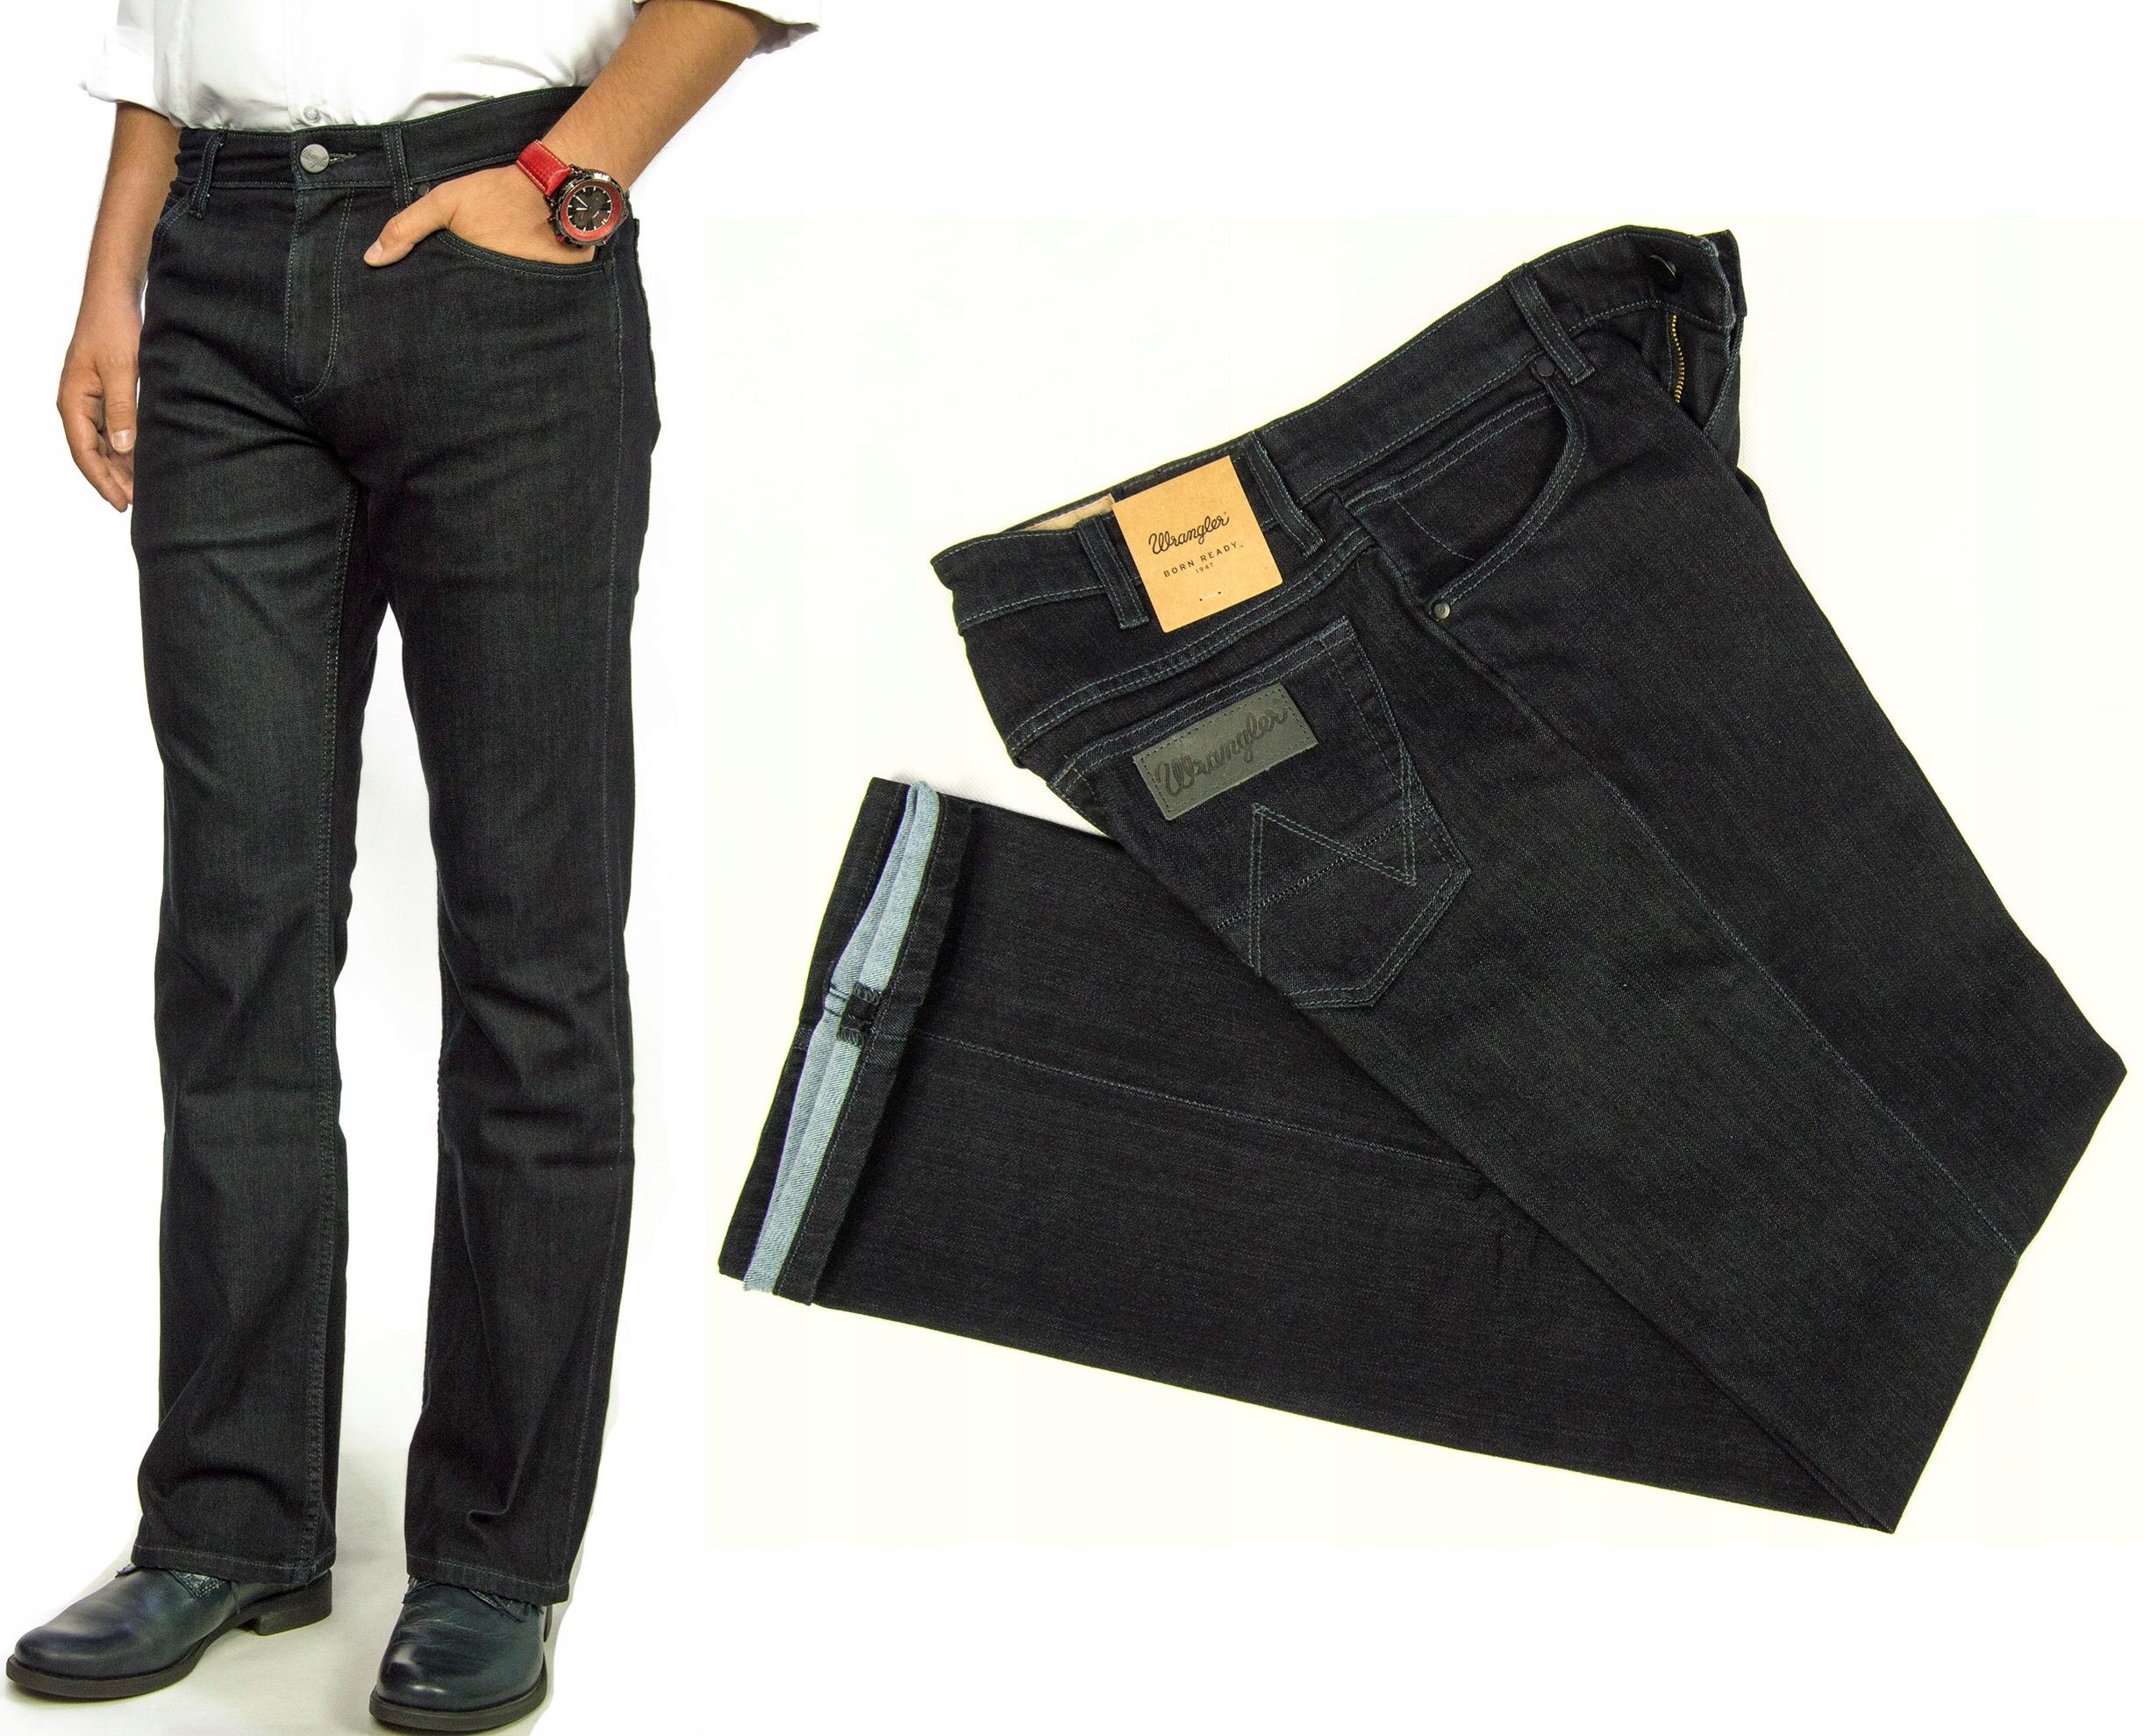 28d4cee670057f Wrangler Jacksville Bootcut spodnie jeansy W32 L34 - 7563976507 ...